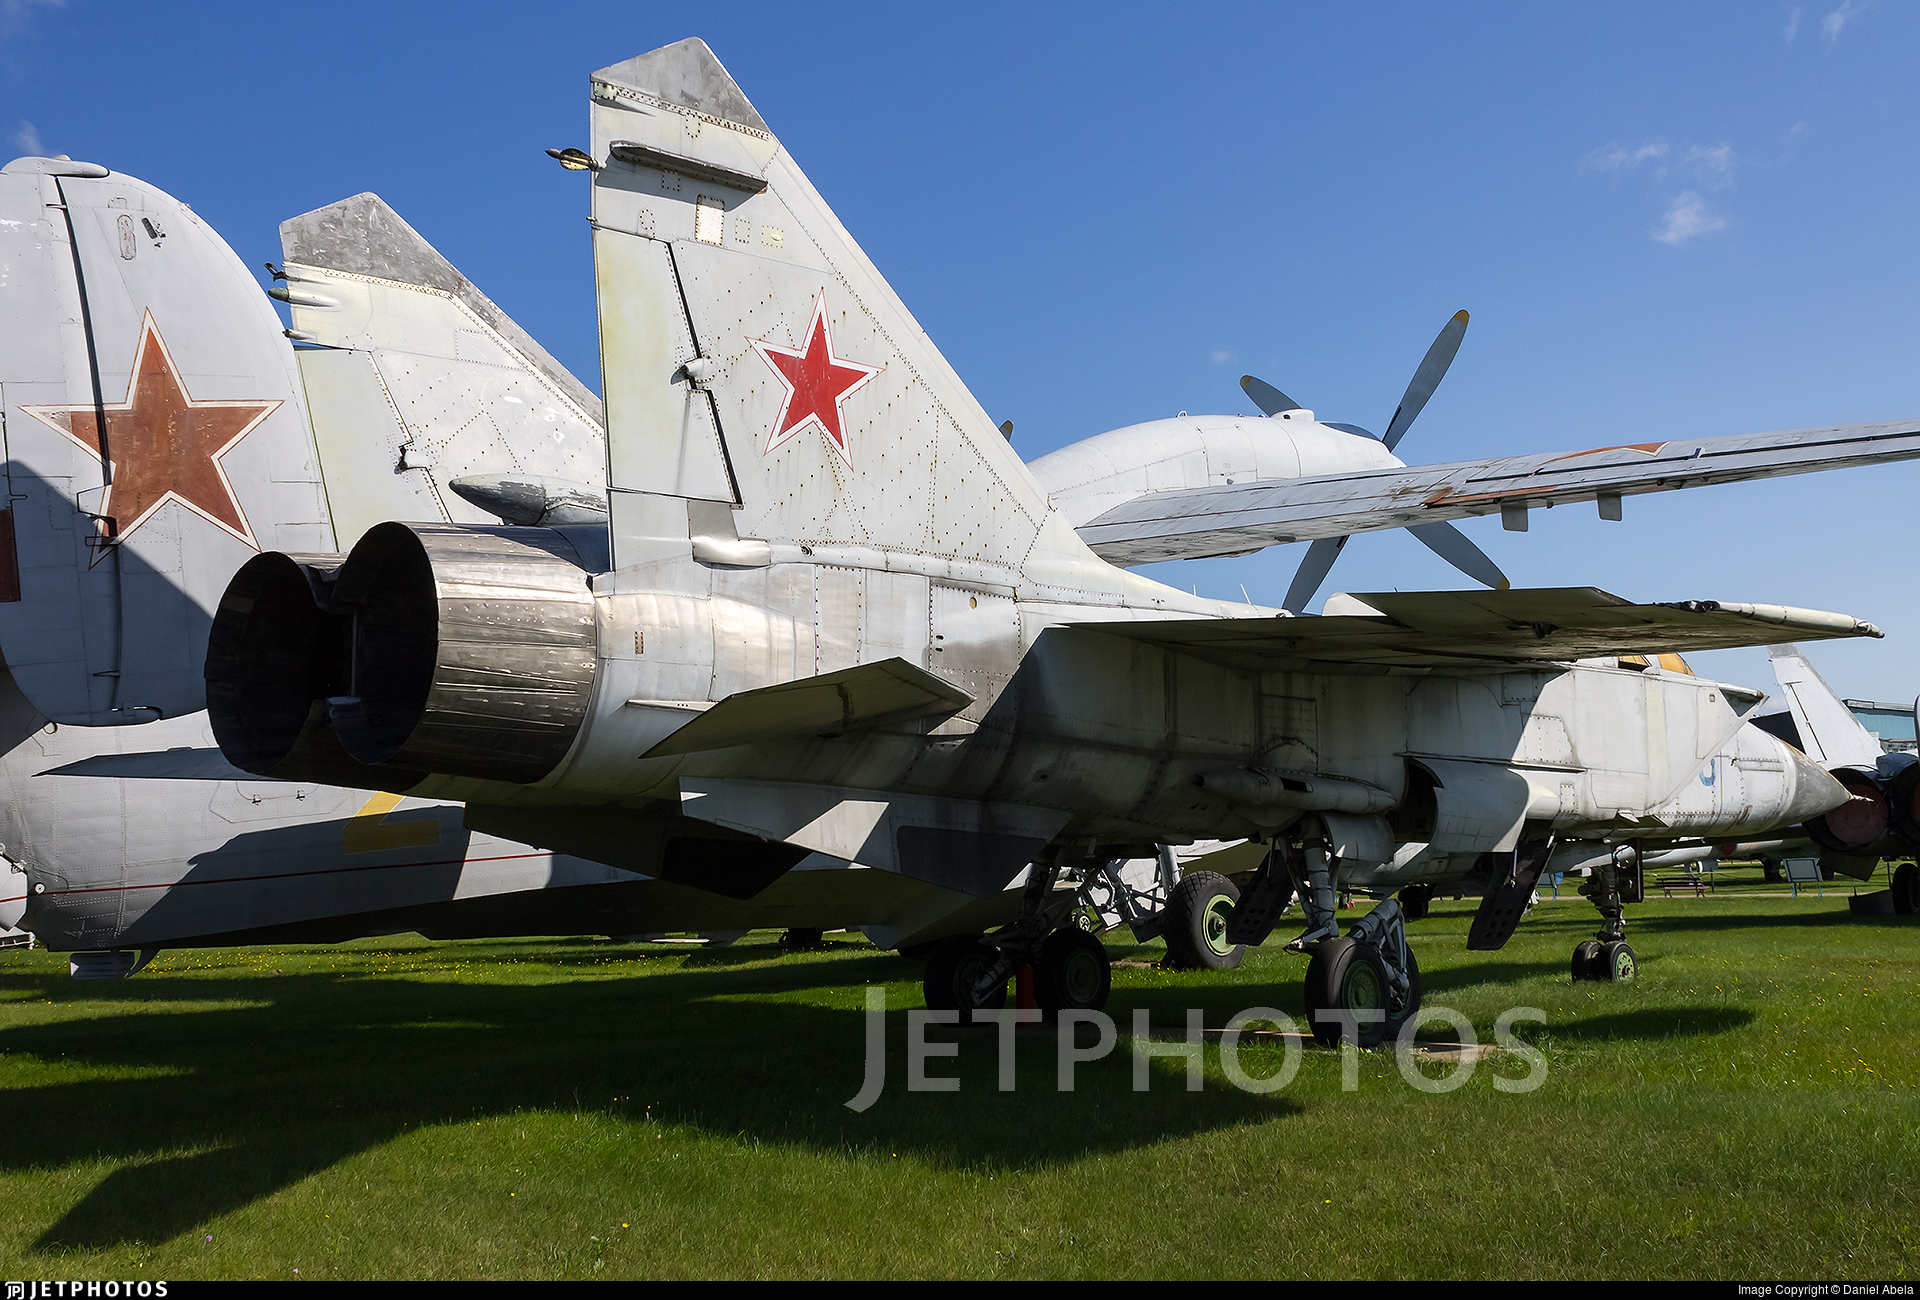 96 - Mikoyan-Gurevich MiG-31 Foxhound - Soviet Union - Air Force